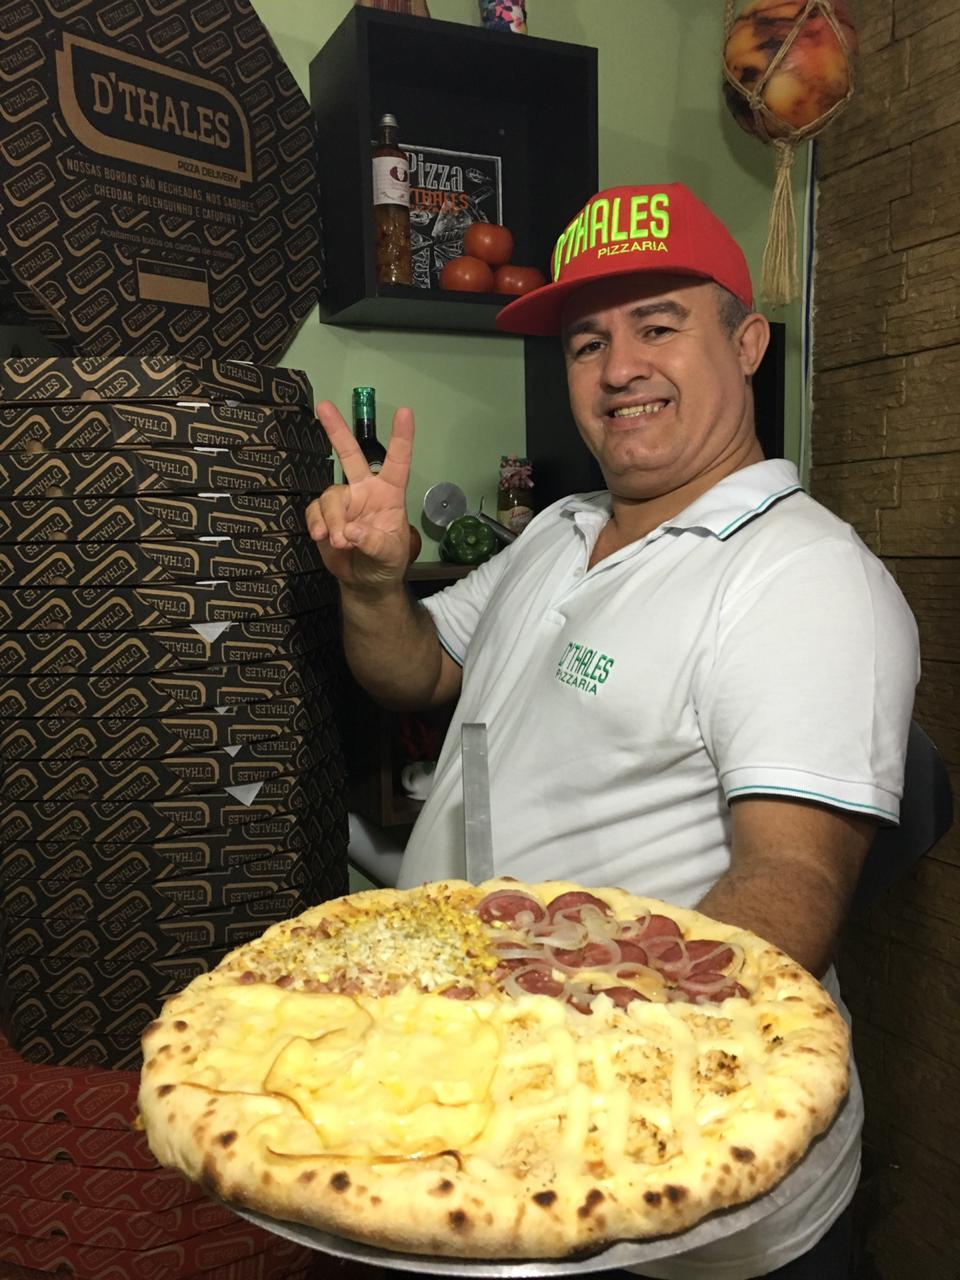 todo-dia-e-dia-de-pizza